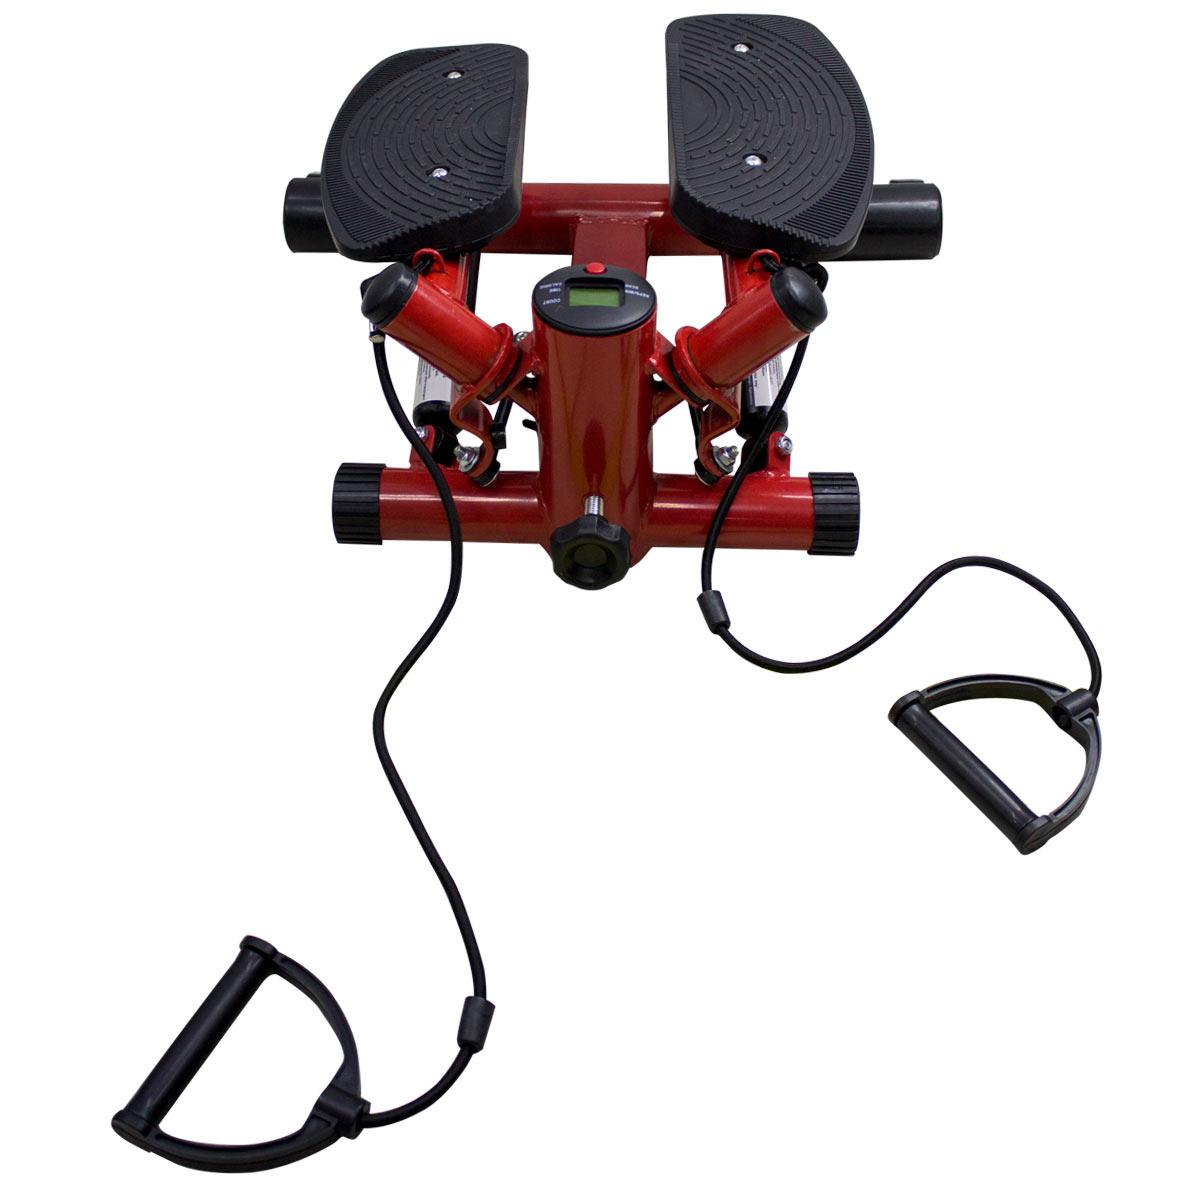 Escaladora Stepper Mini 120Kg + Bandas Resistencia Ejercicio